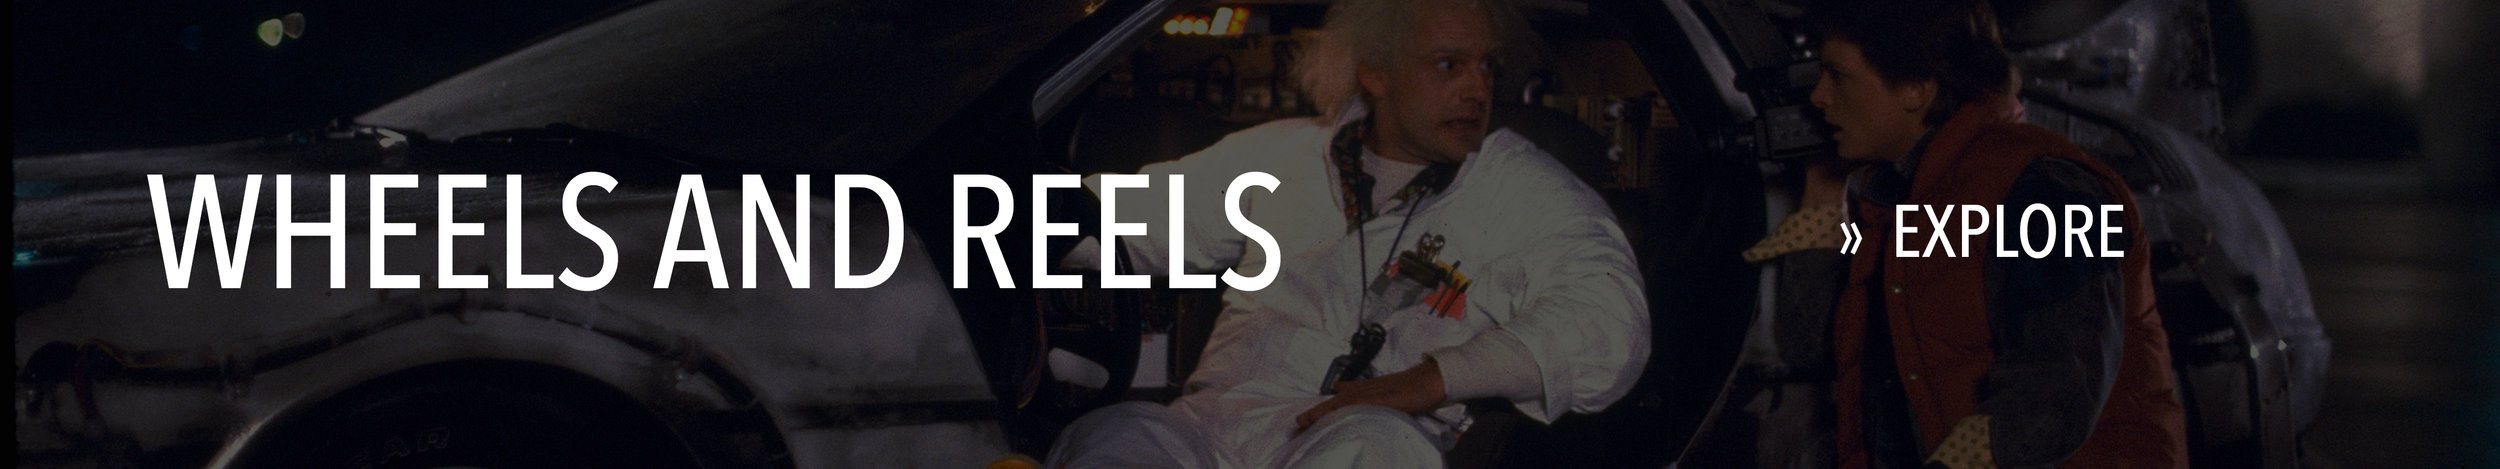 Wheels and Reels